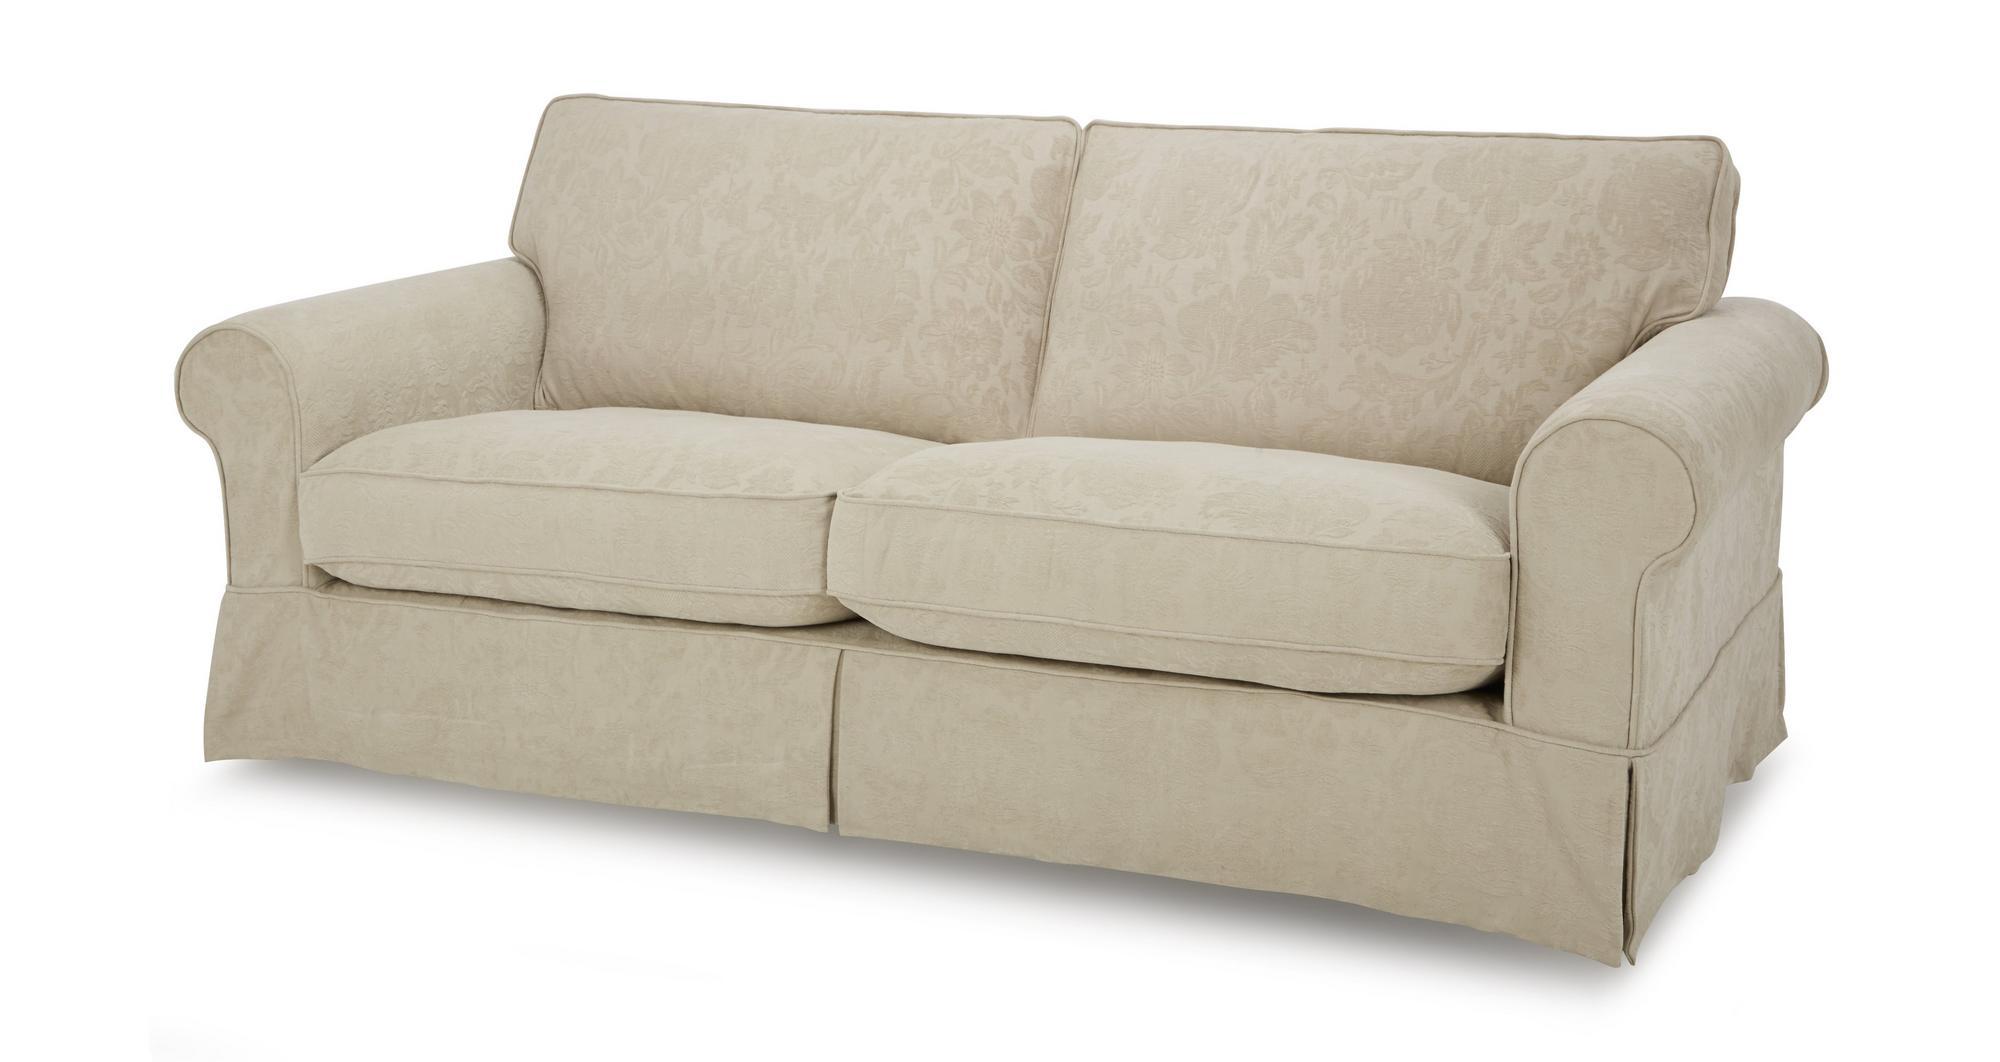 Dfs Kendal Linen Pattern Fabric Formal Back Grand Sofa Ebay